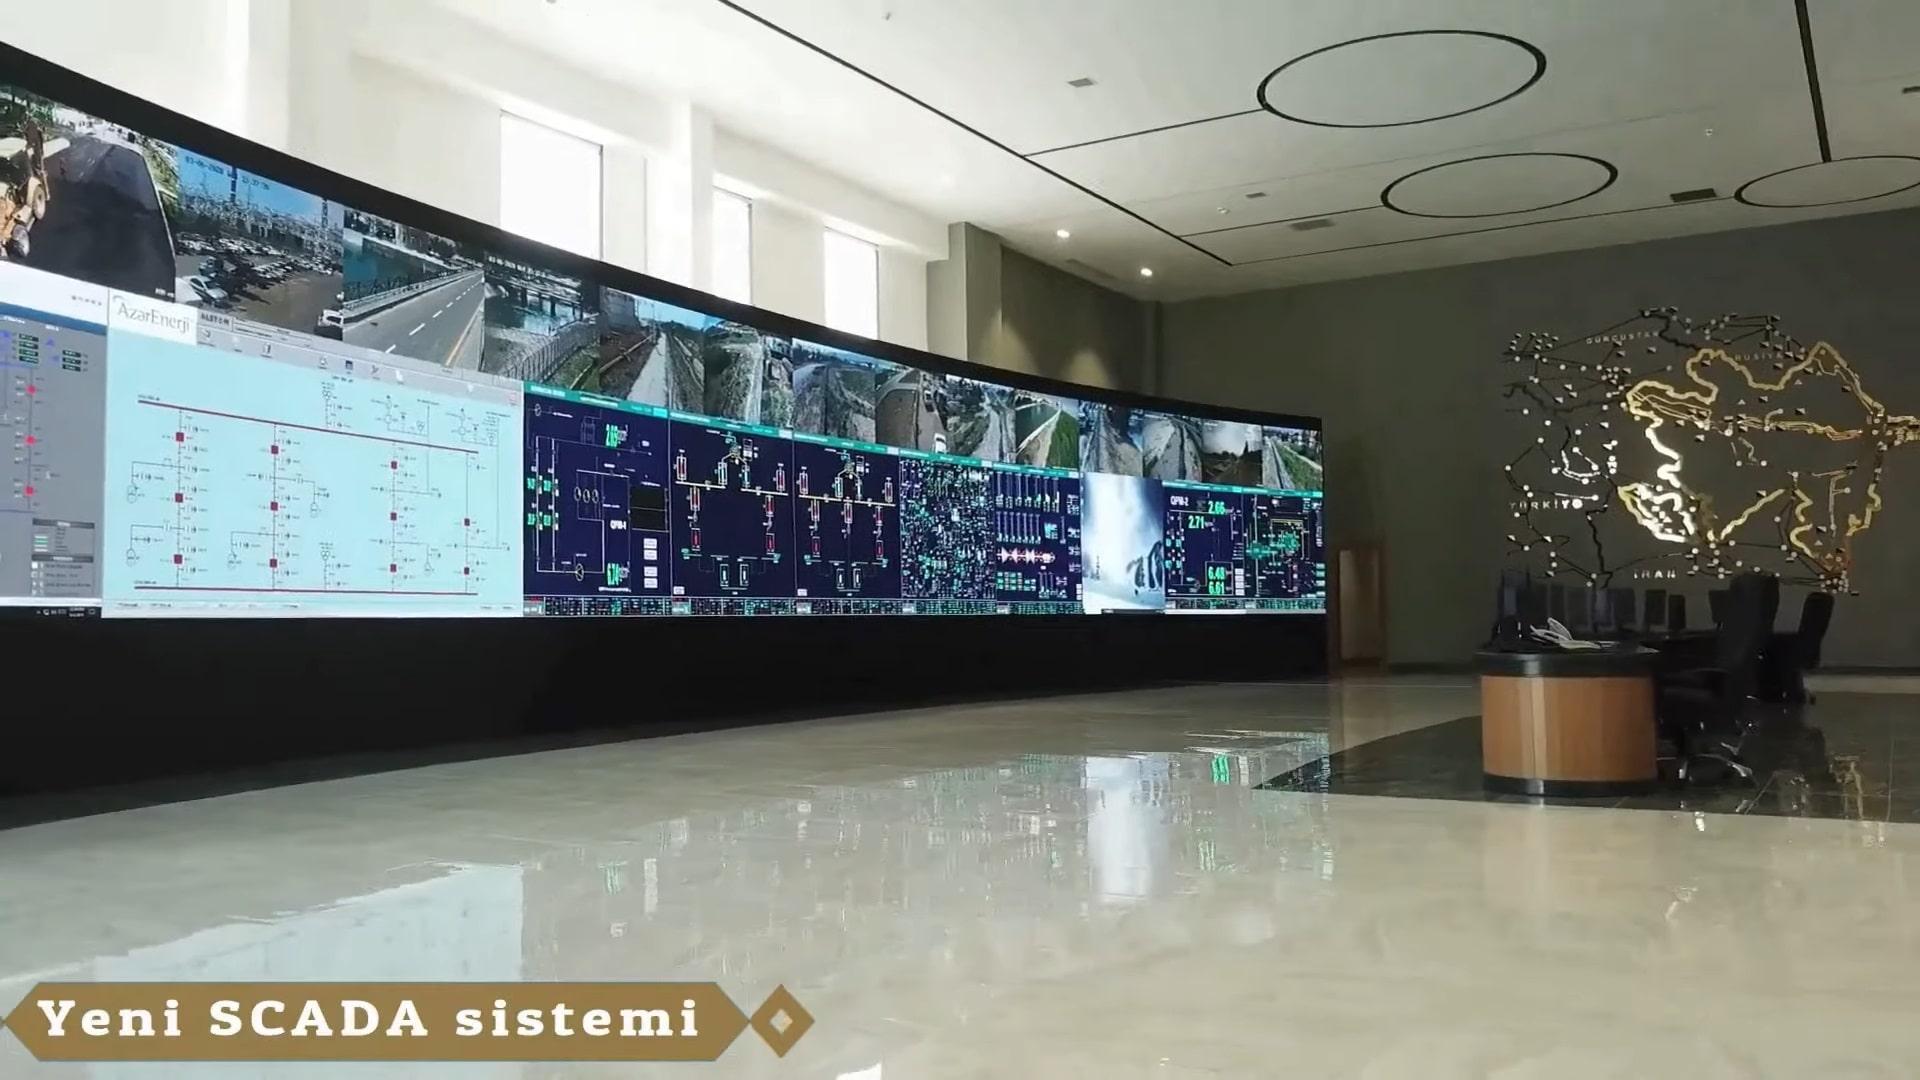 Azərenerji SCADA sistemi